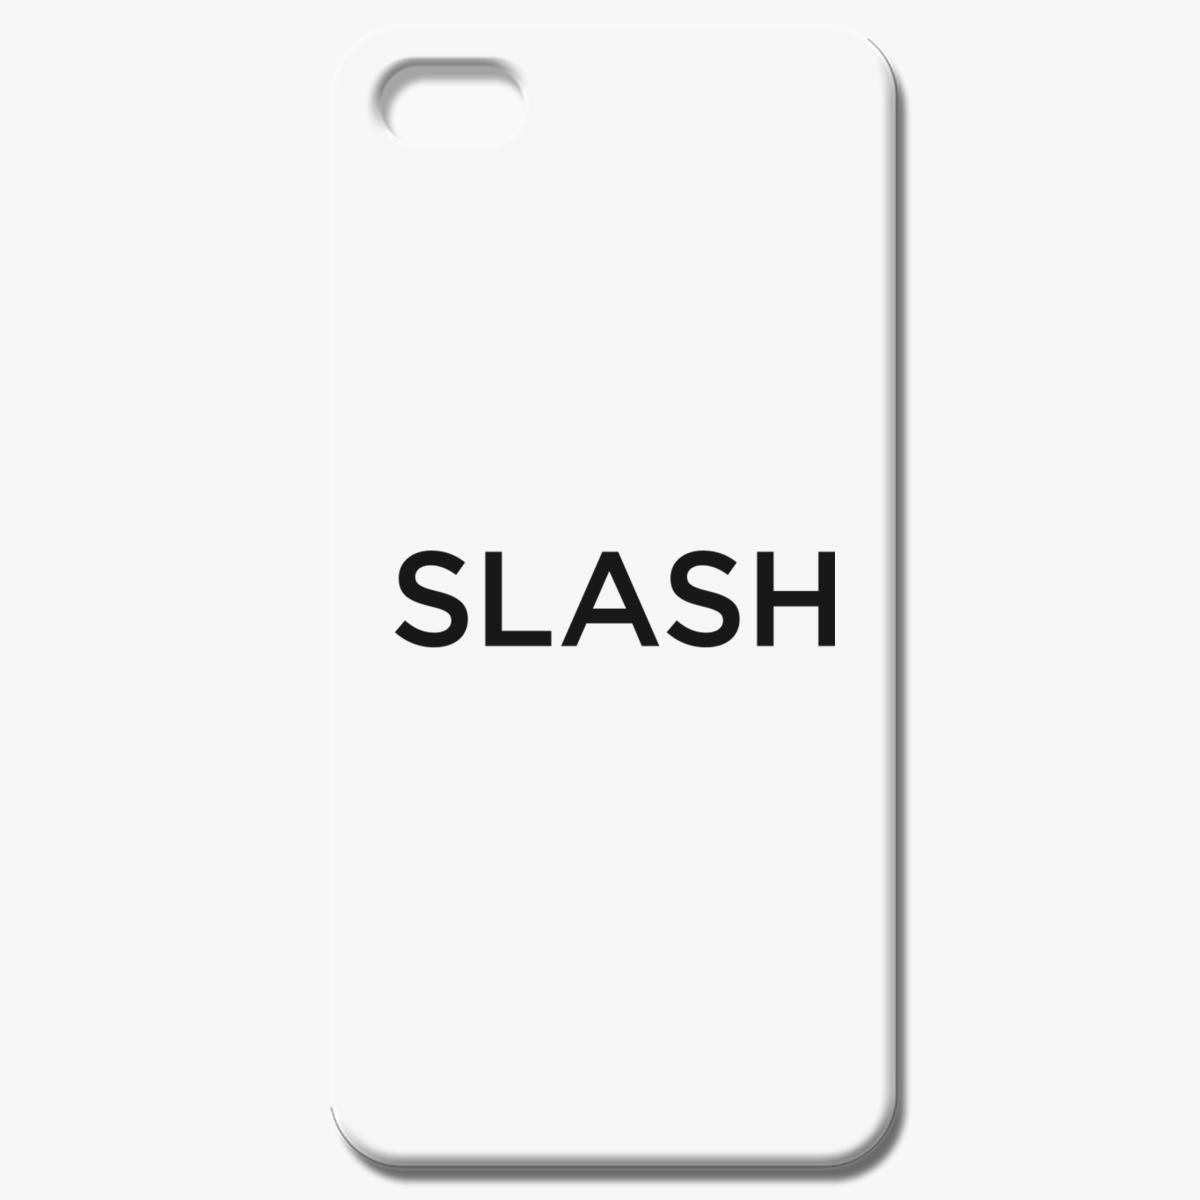 Slash Iphone 7 Case